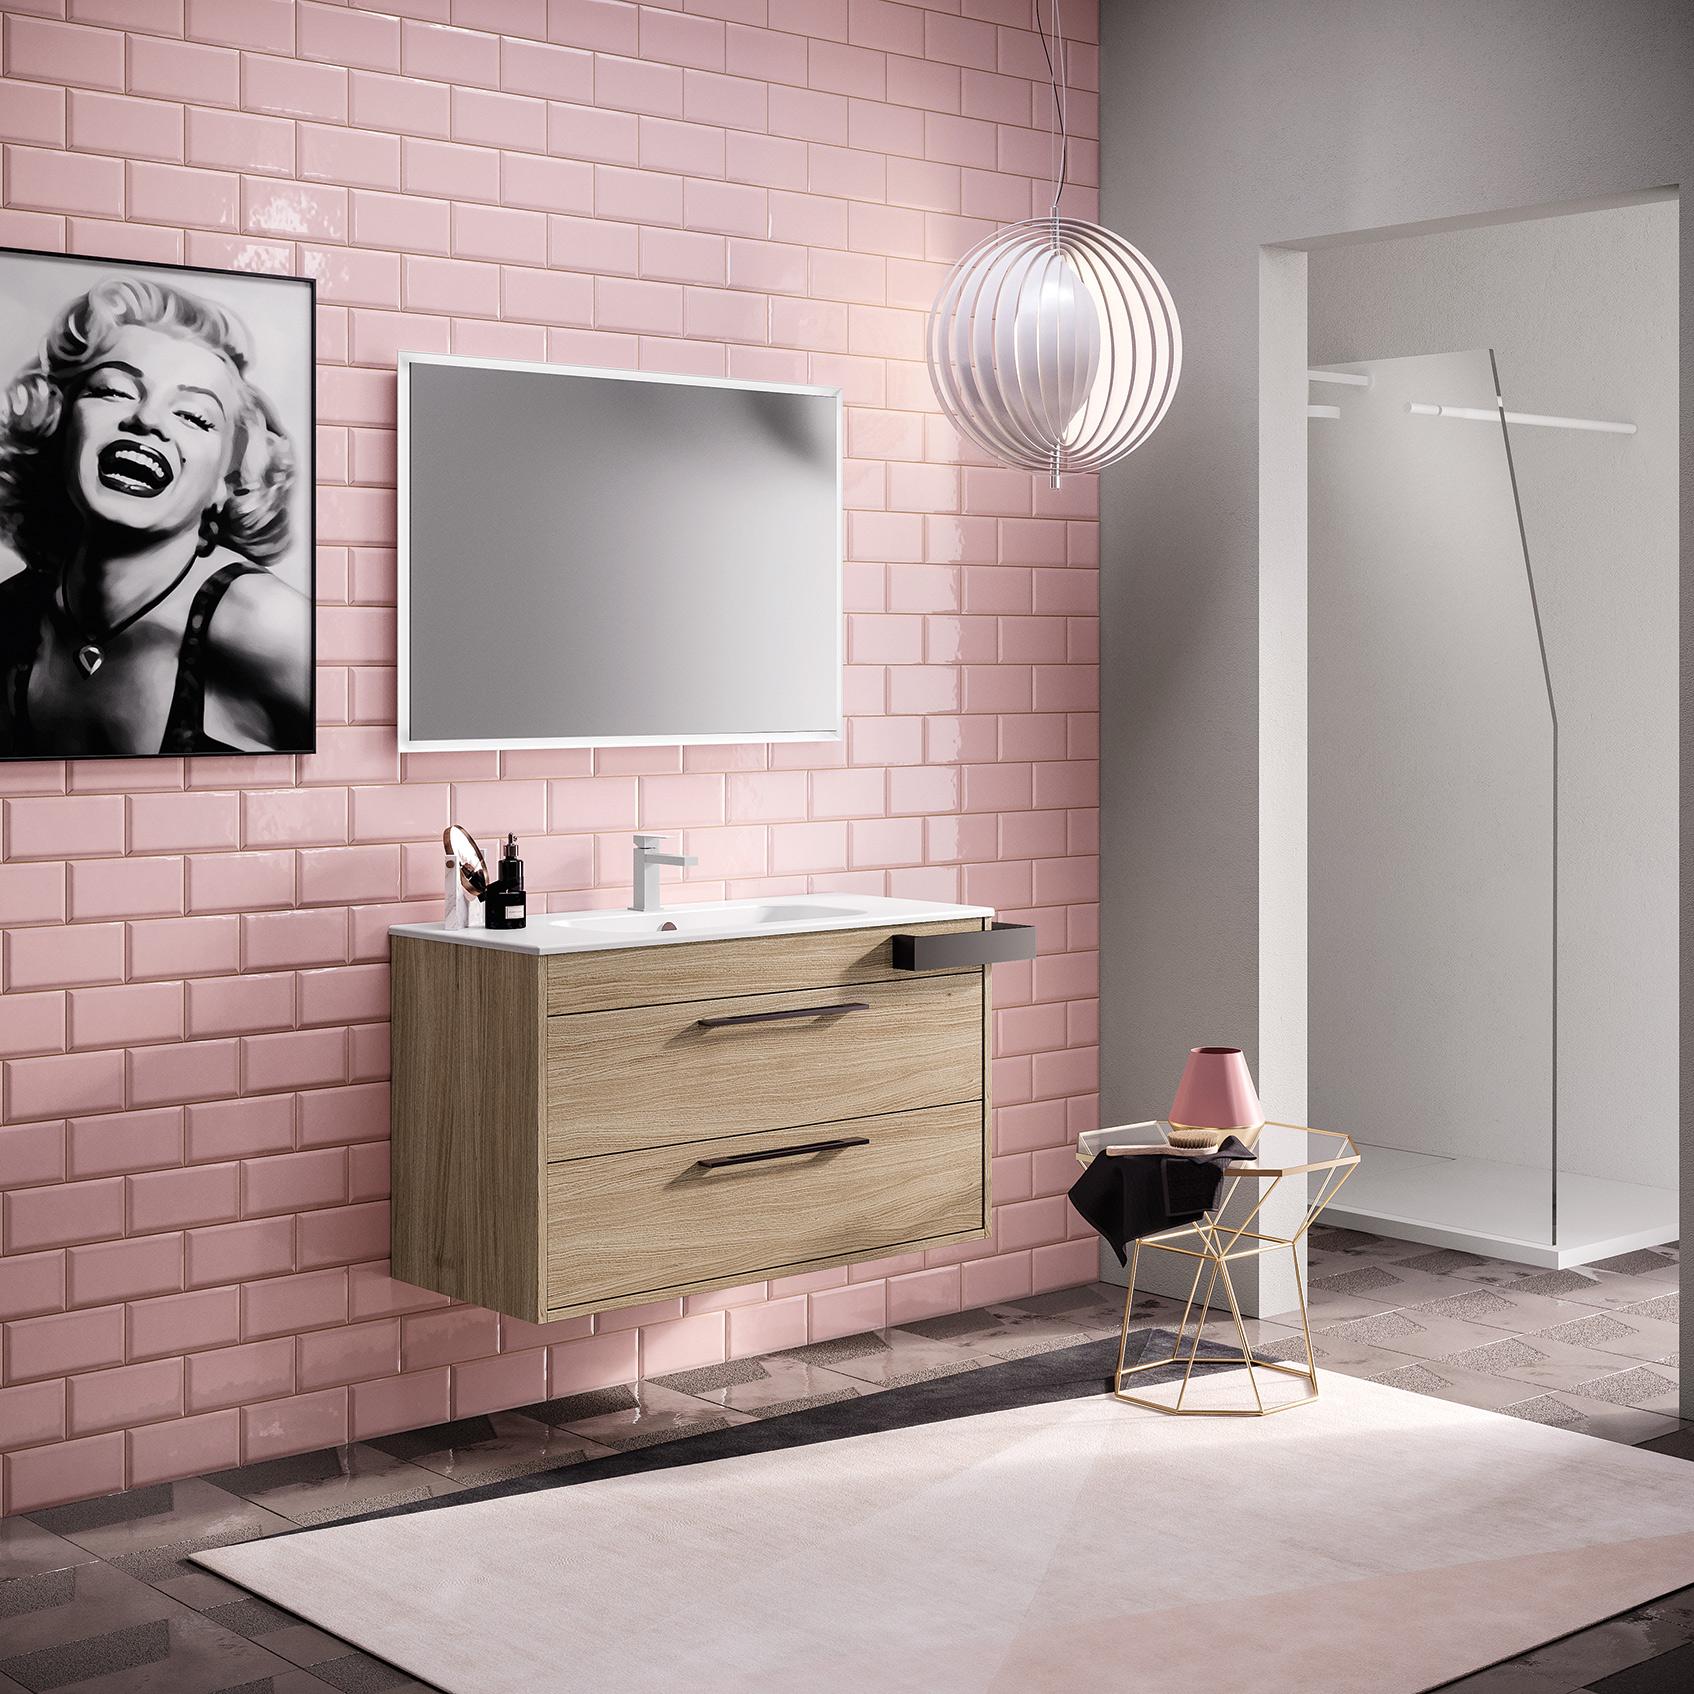 Bathroom furniture,bathroom cabinets - smart 9.1 1